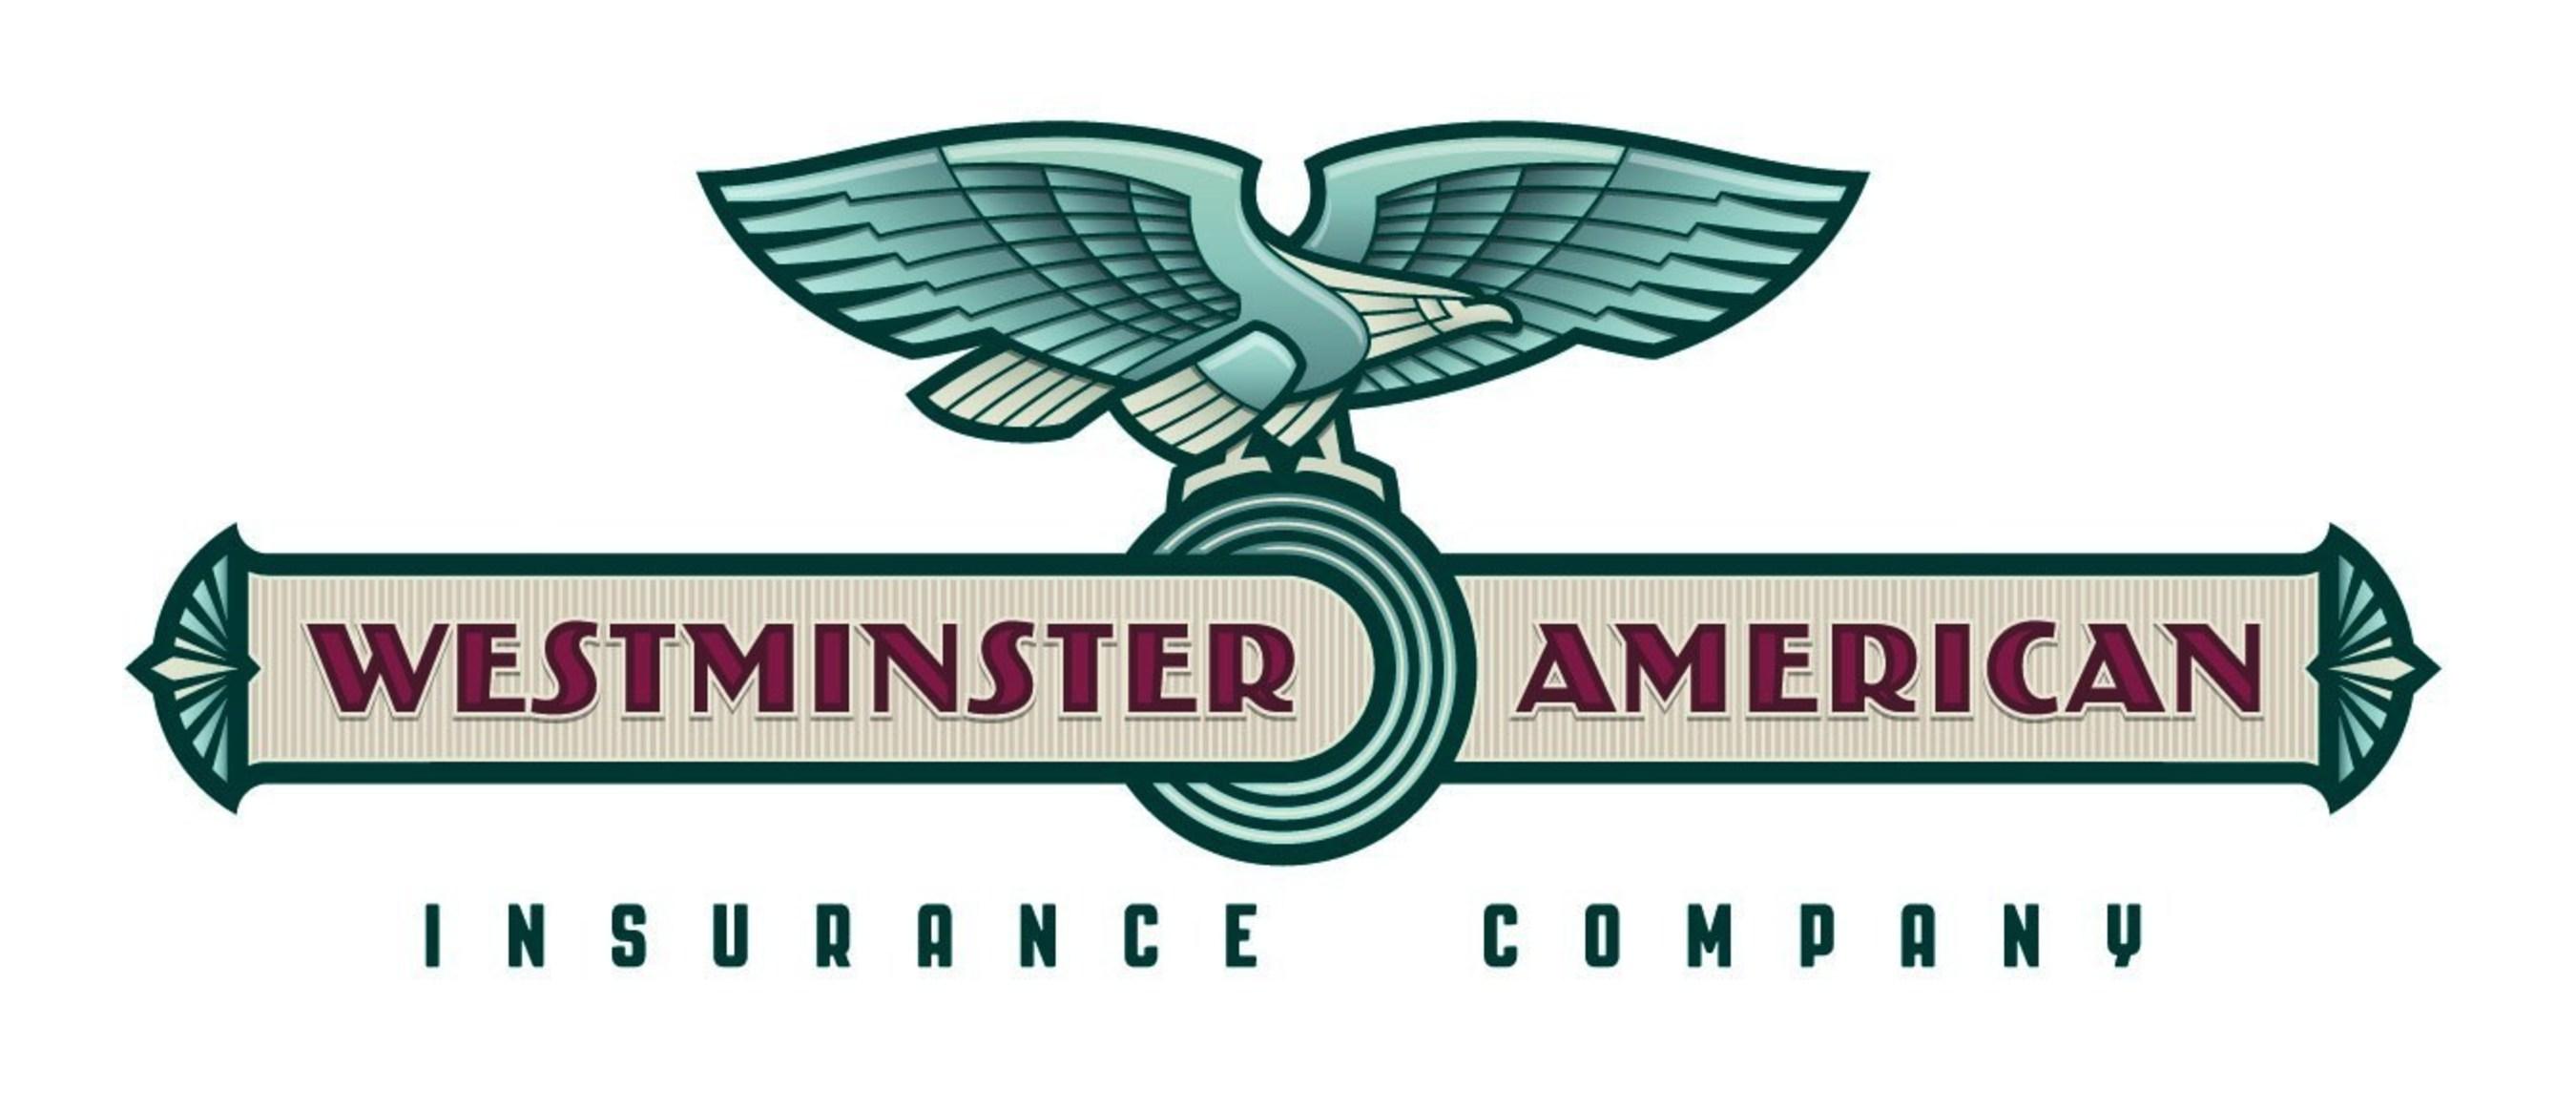 Westminster American Insurance Company Names John Scott ...